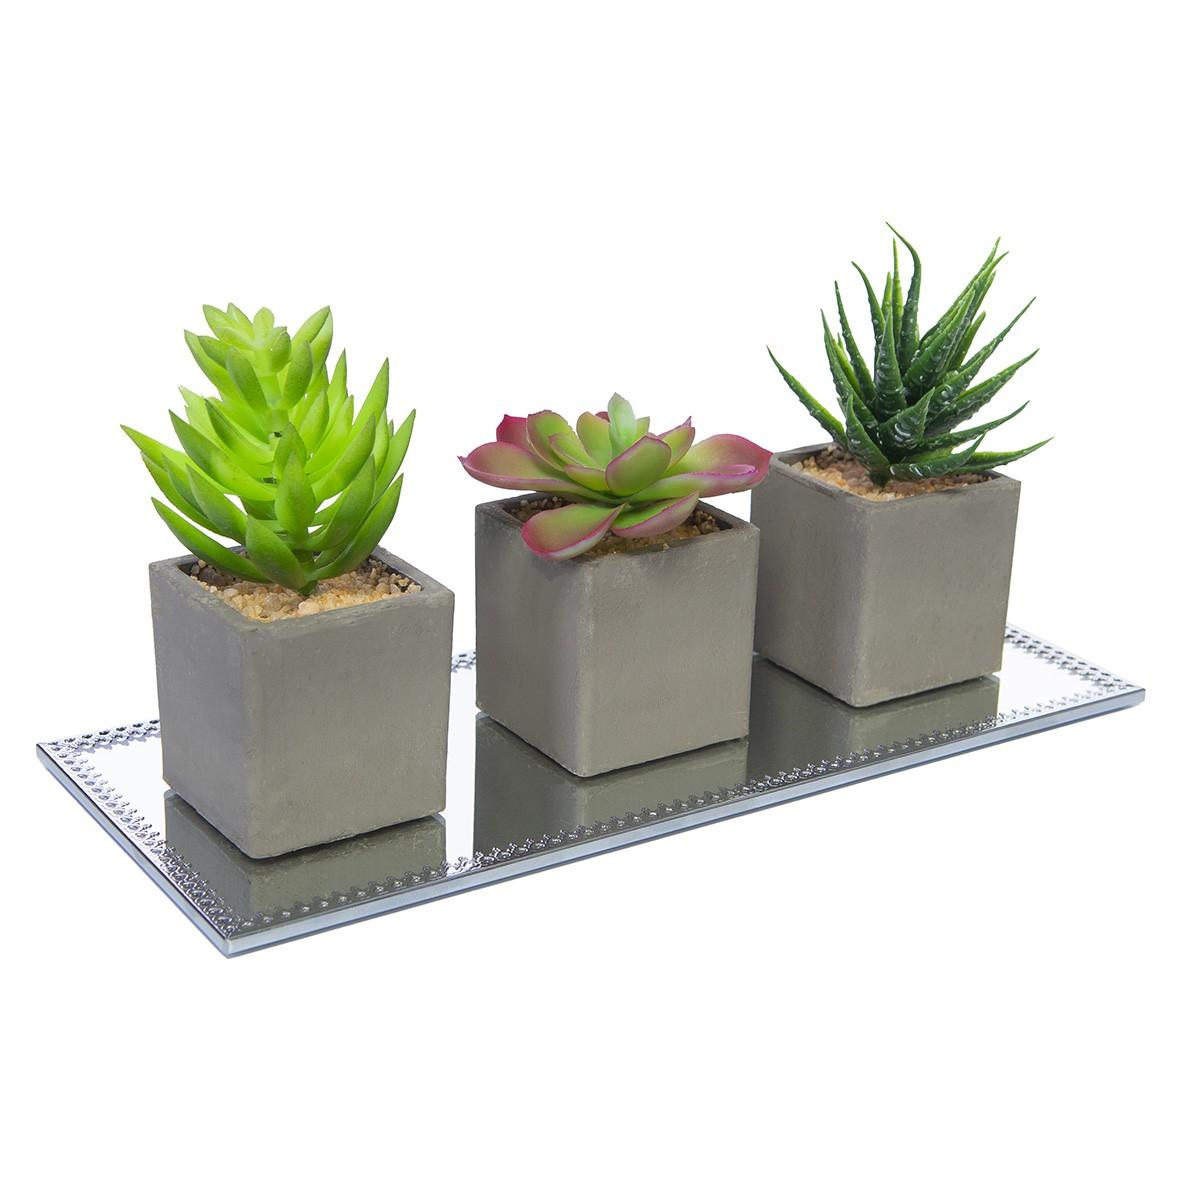 Kit com 3 Vasos Planta Permanente Suculenta + base Espelhada